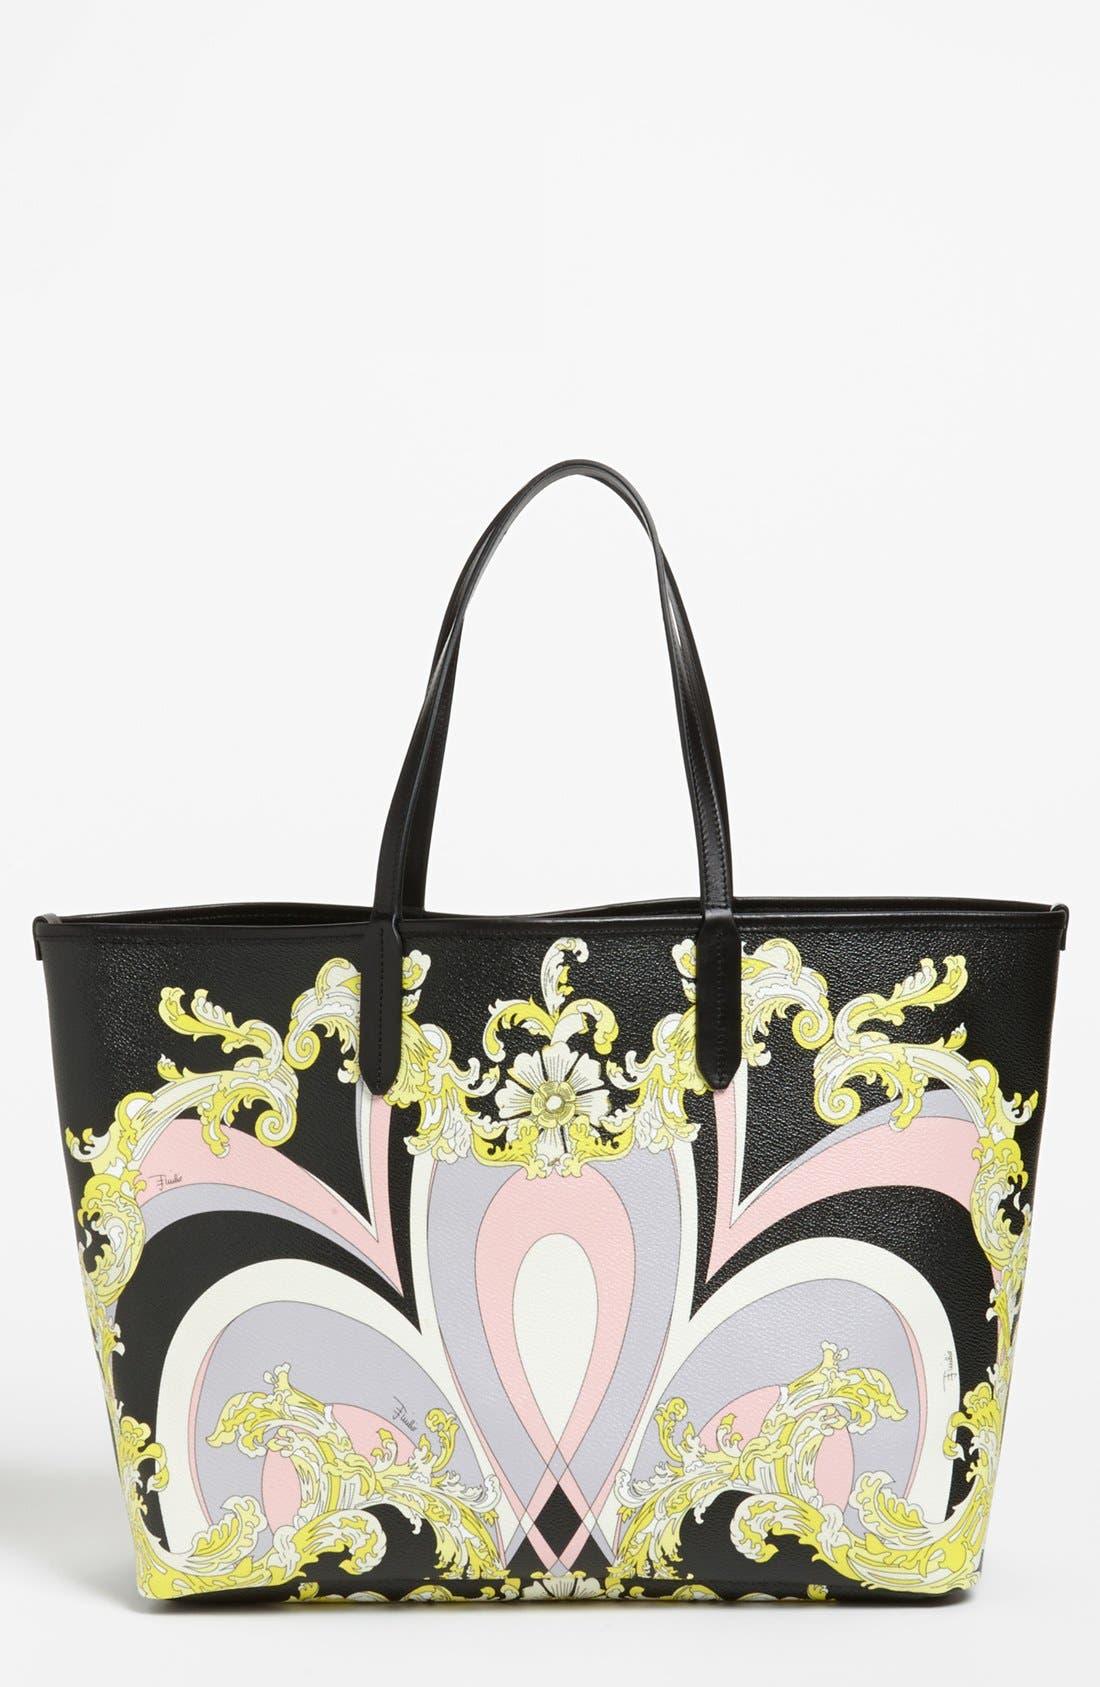 Main Image - Emilio Pucci 'Large' Shopping Tote